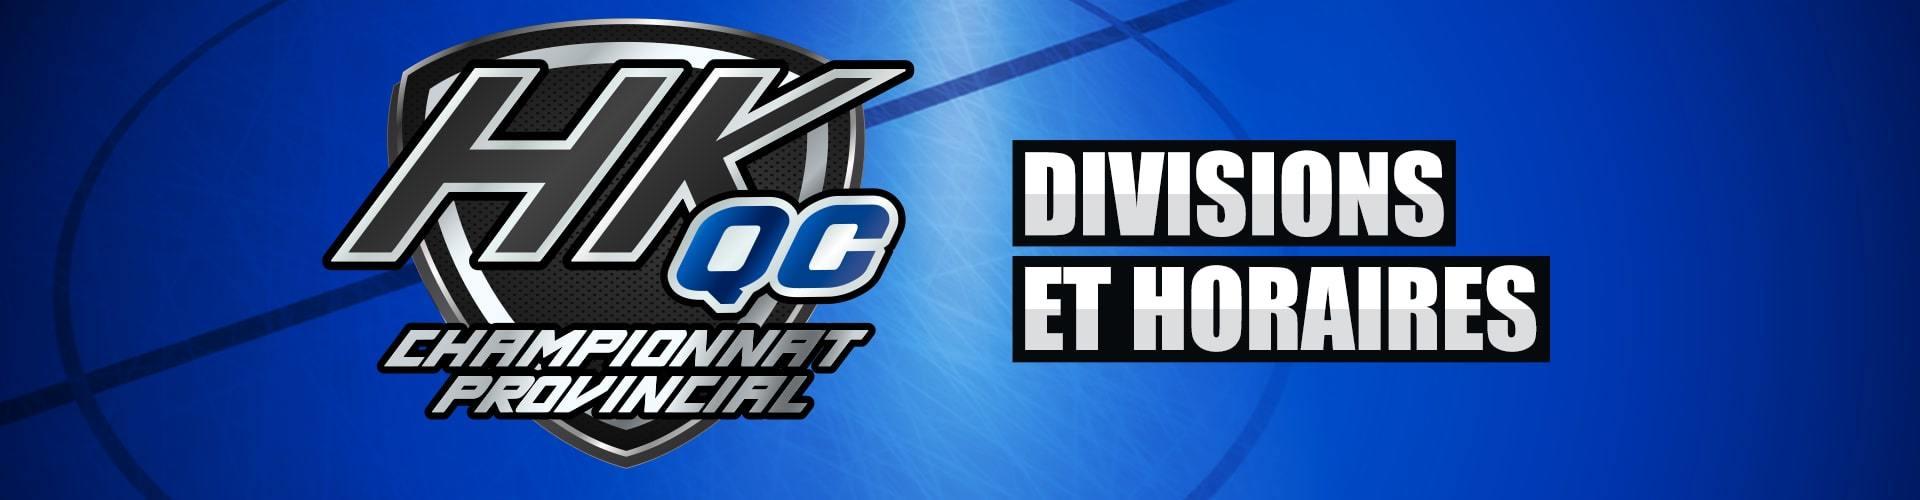 Championnat provincial